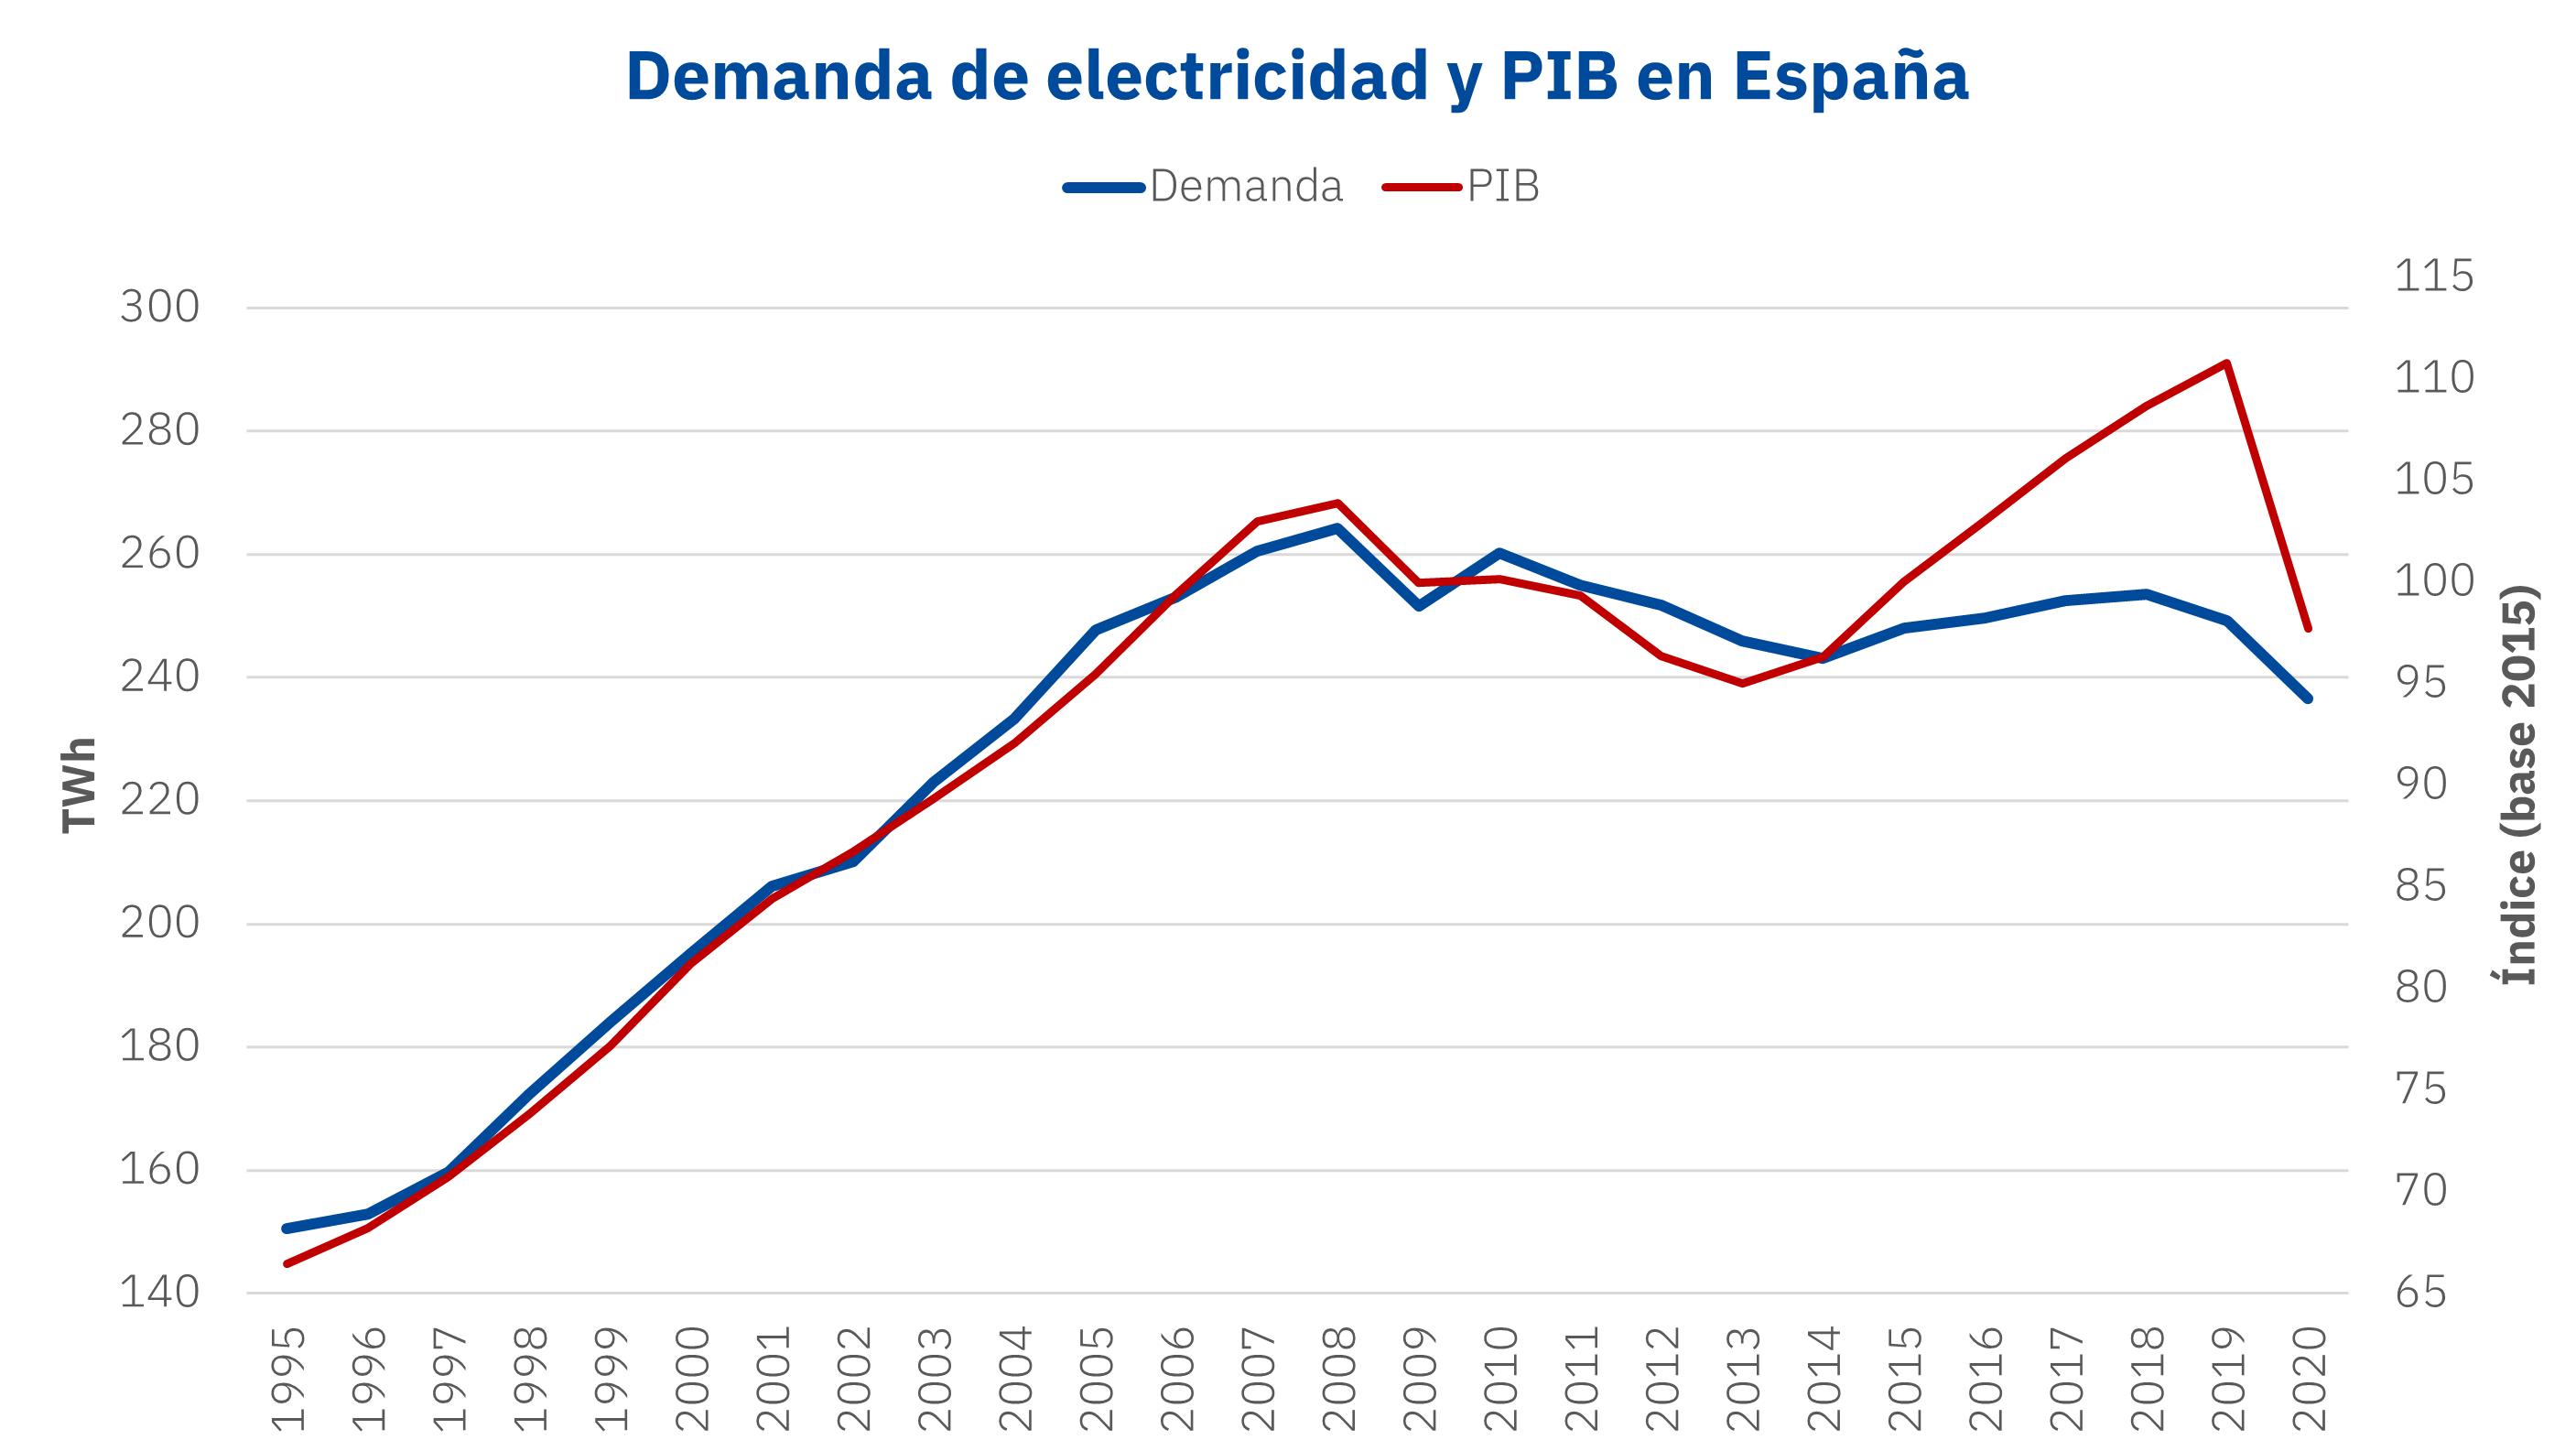 AleaSoft - Demanda electricidad PIB Espanna